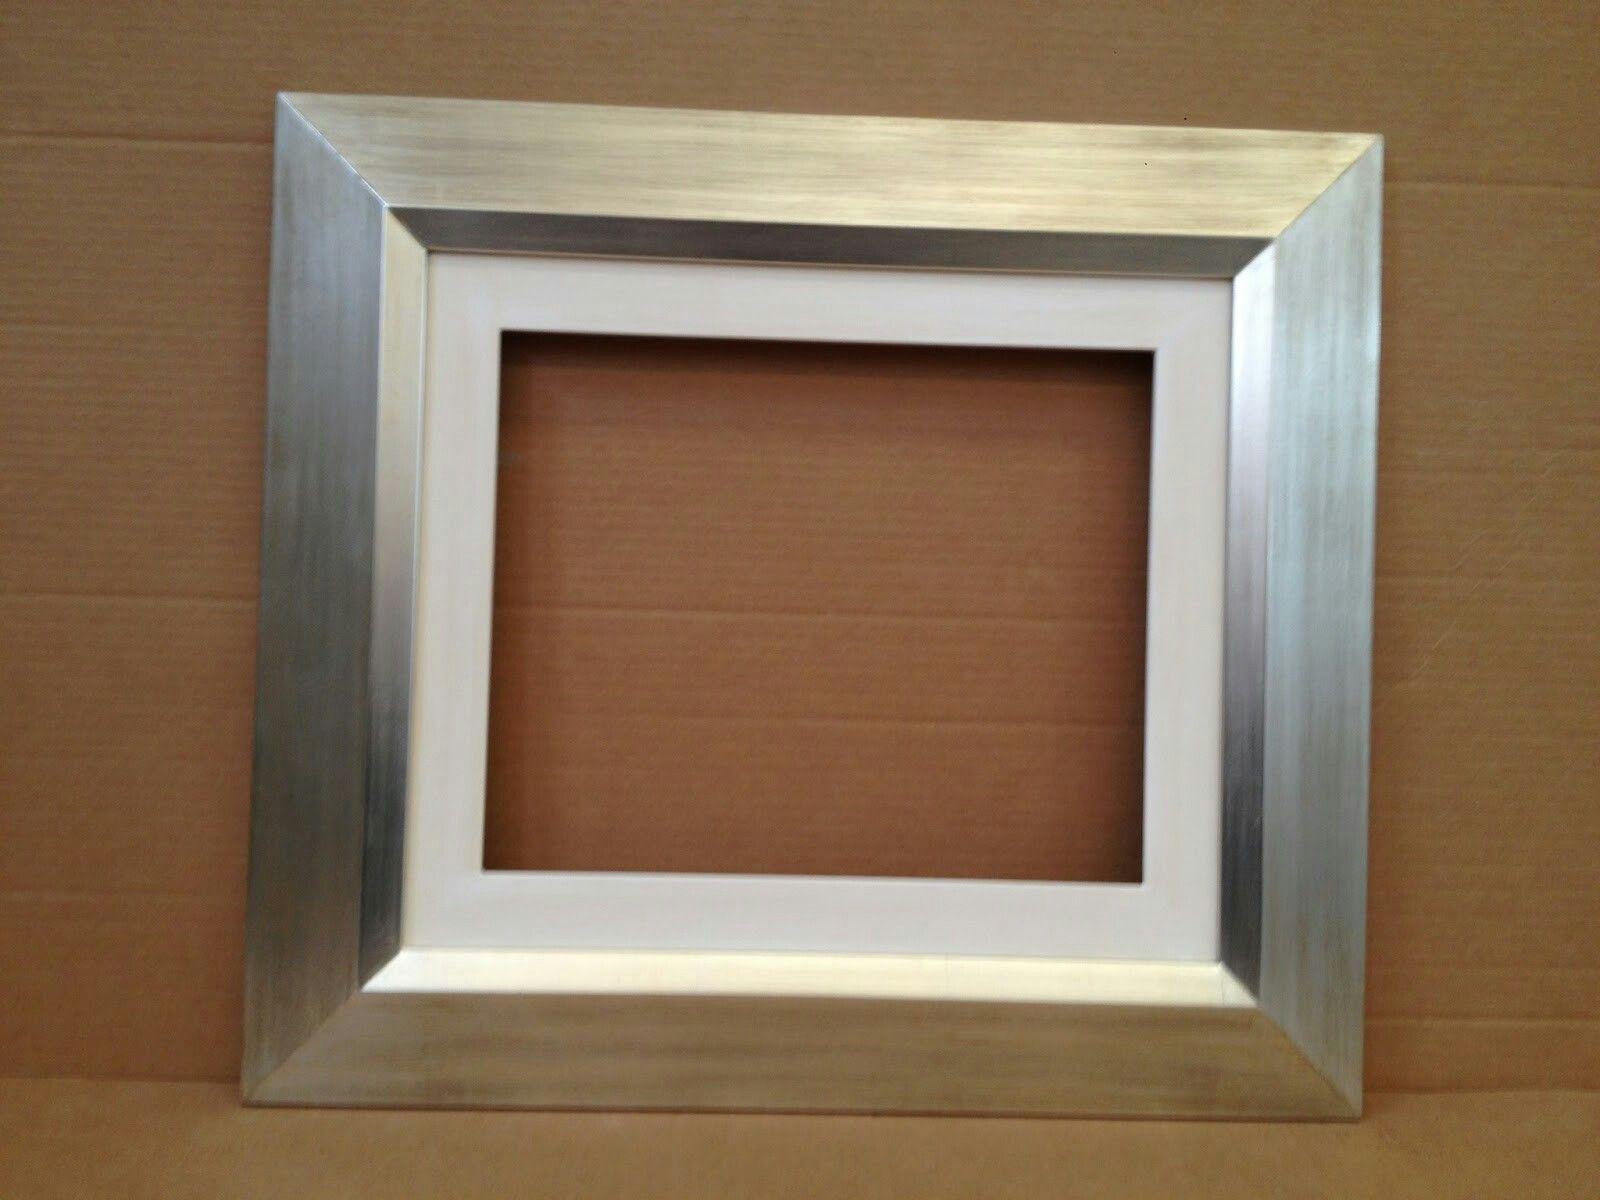 Marco para cuadro madera pinterest marcos para - Cuadros para comedor moderno ...